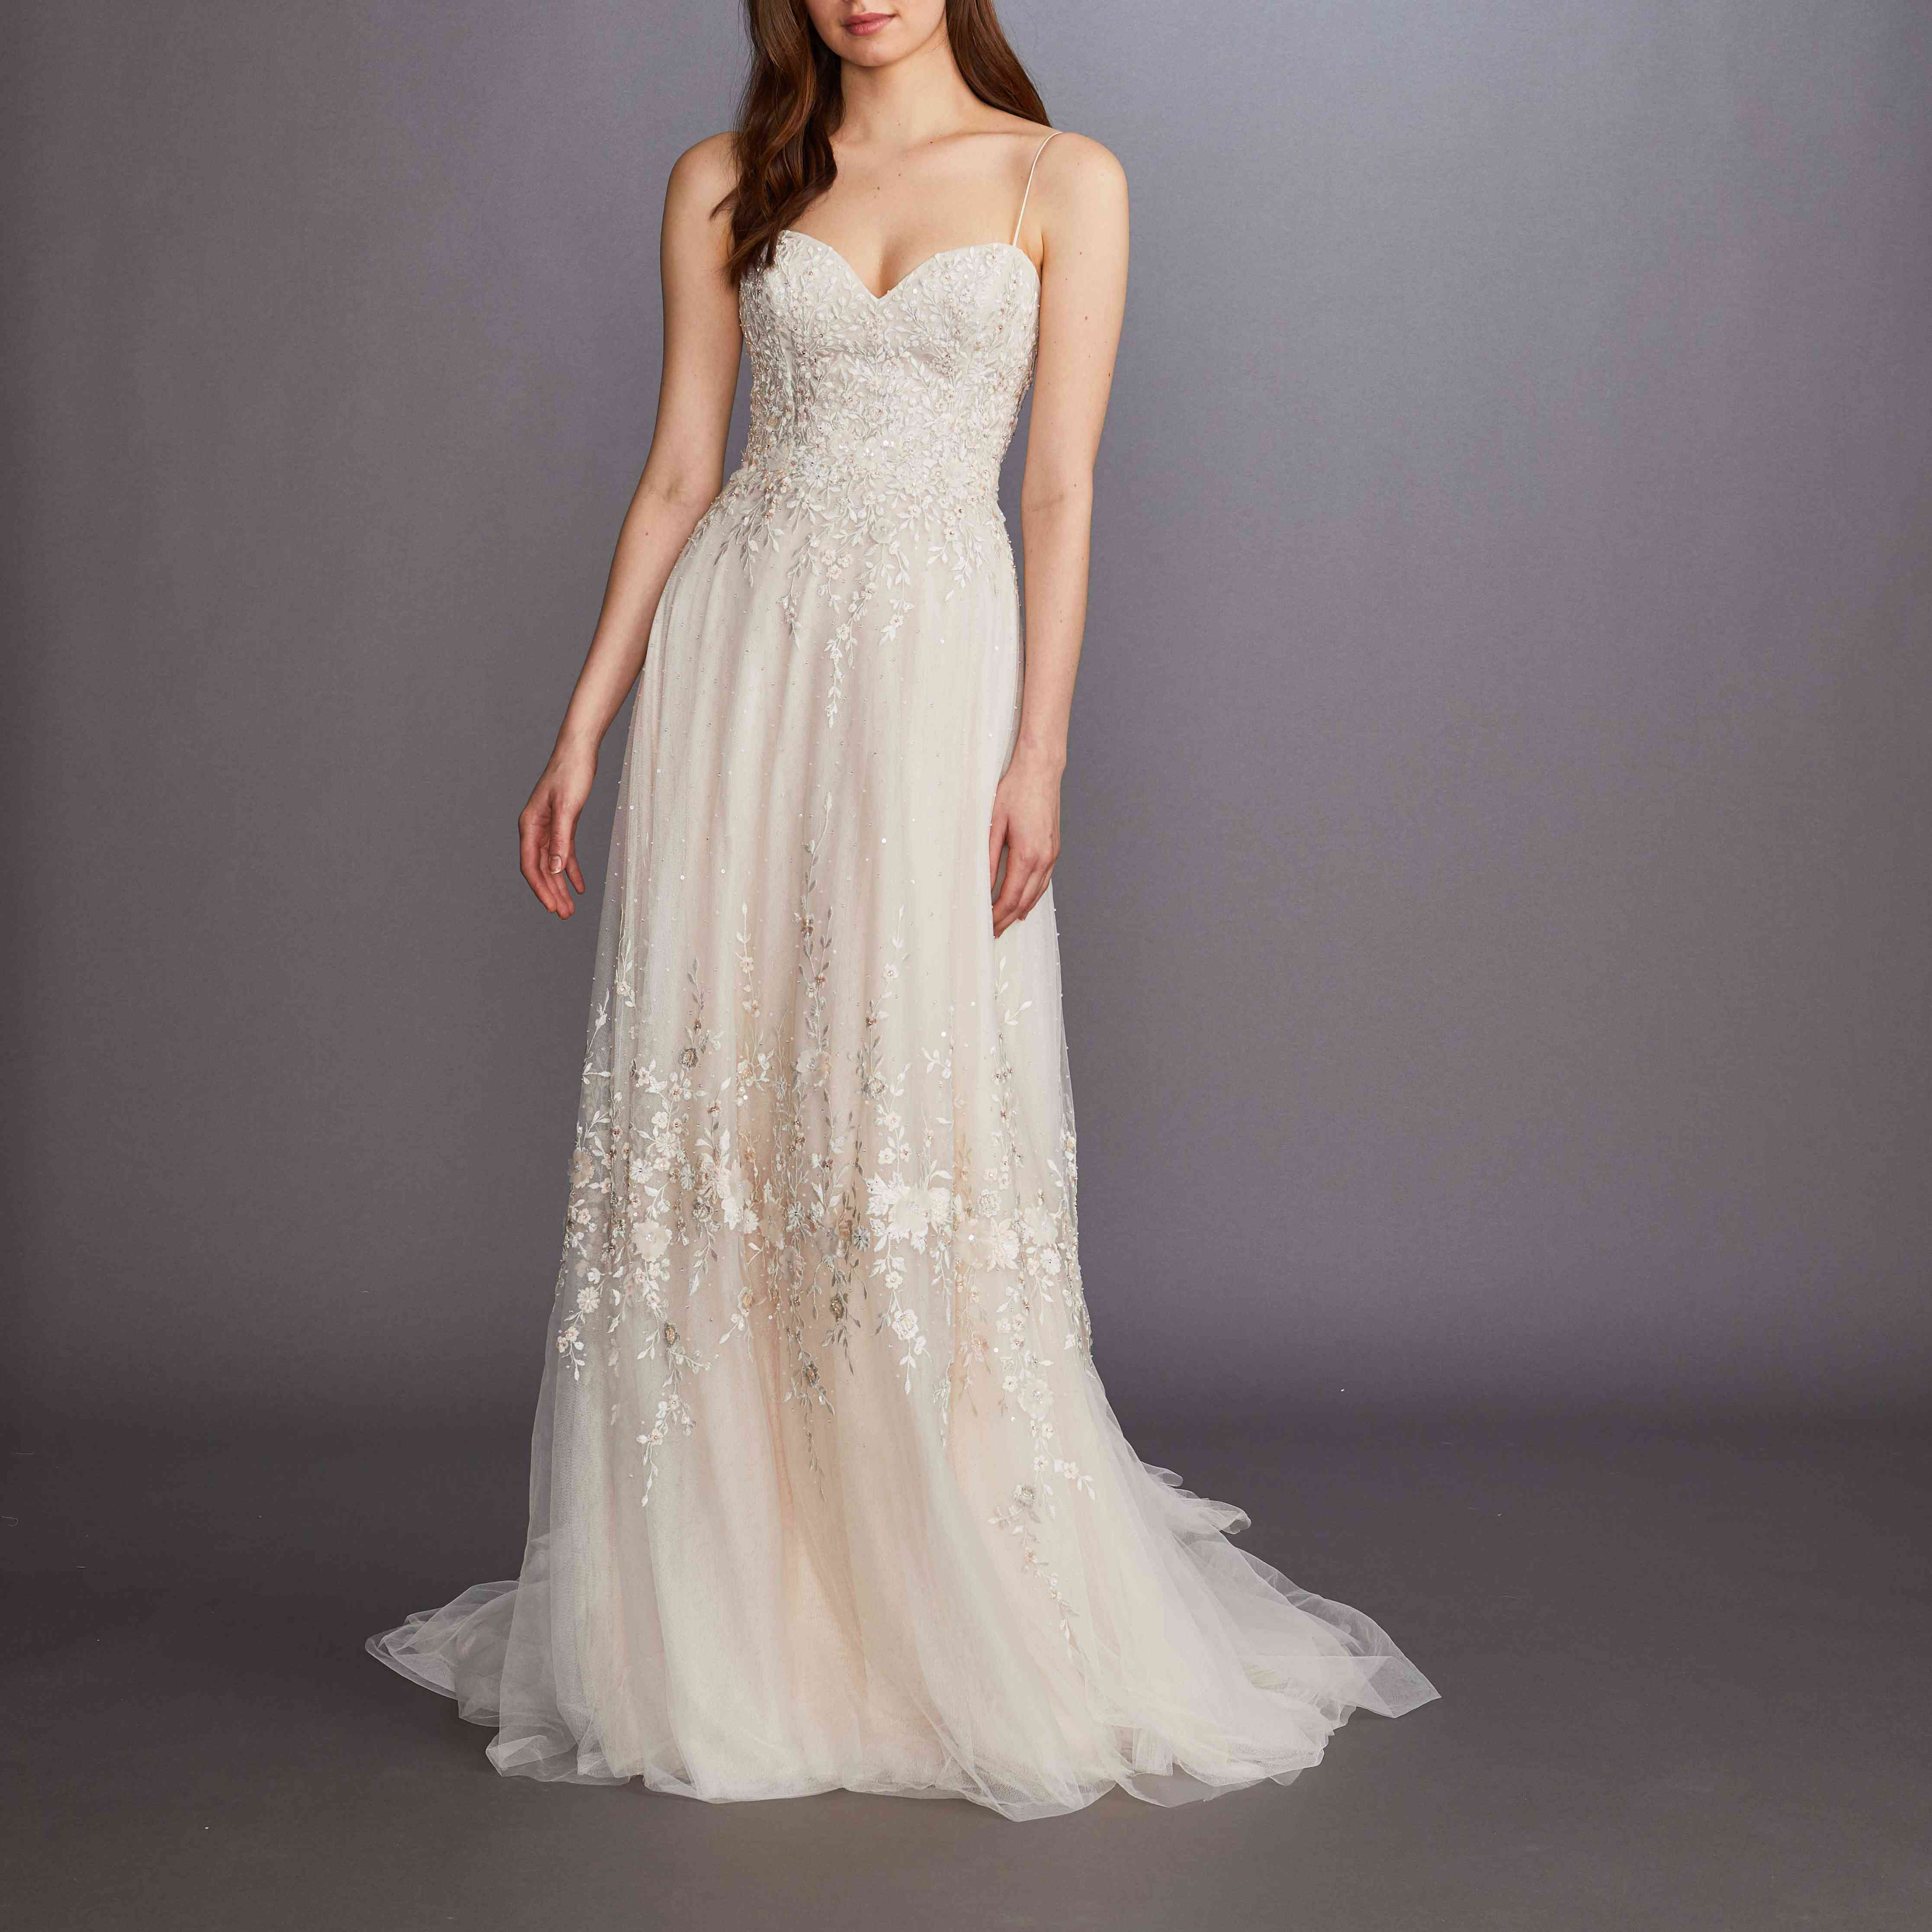 Linden sleeveless wedding dress by Lazaro